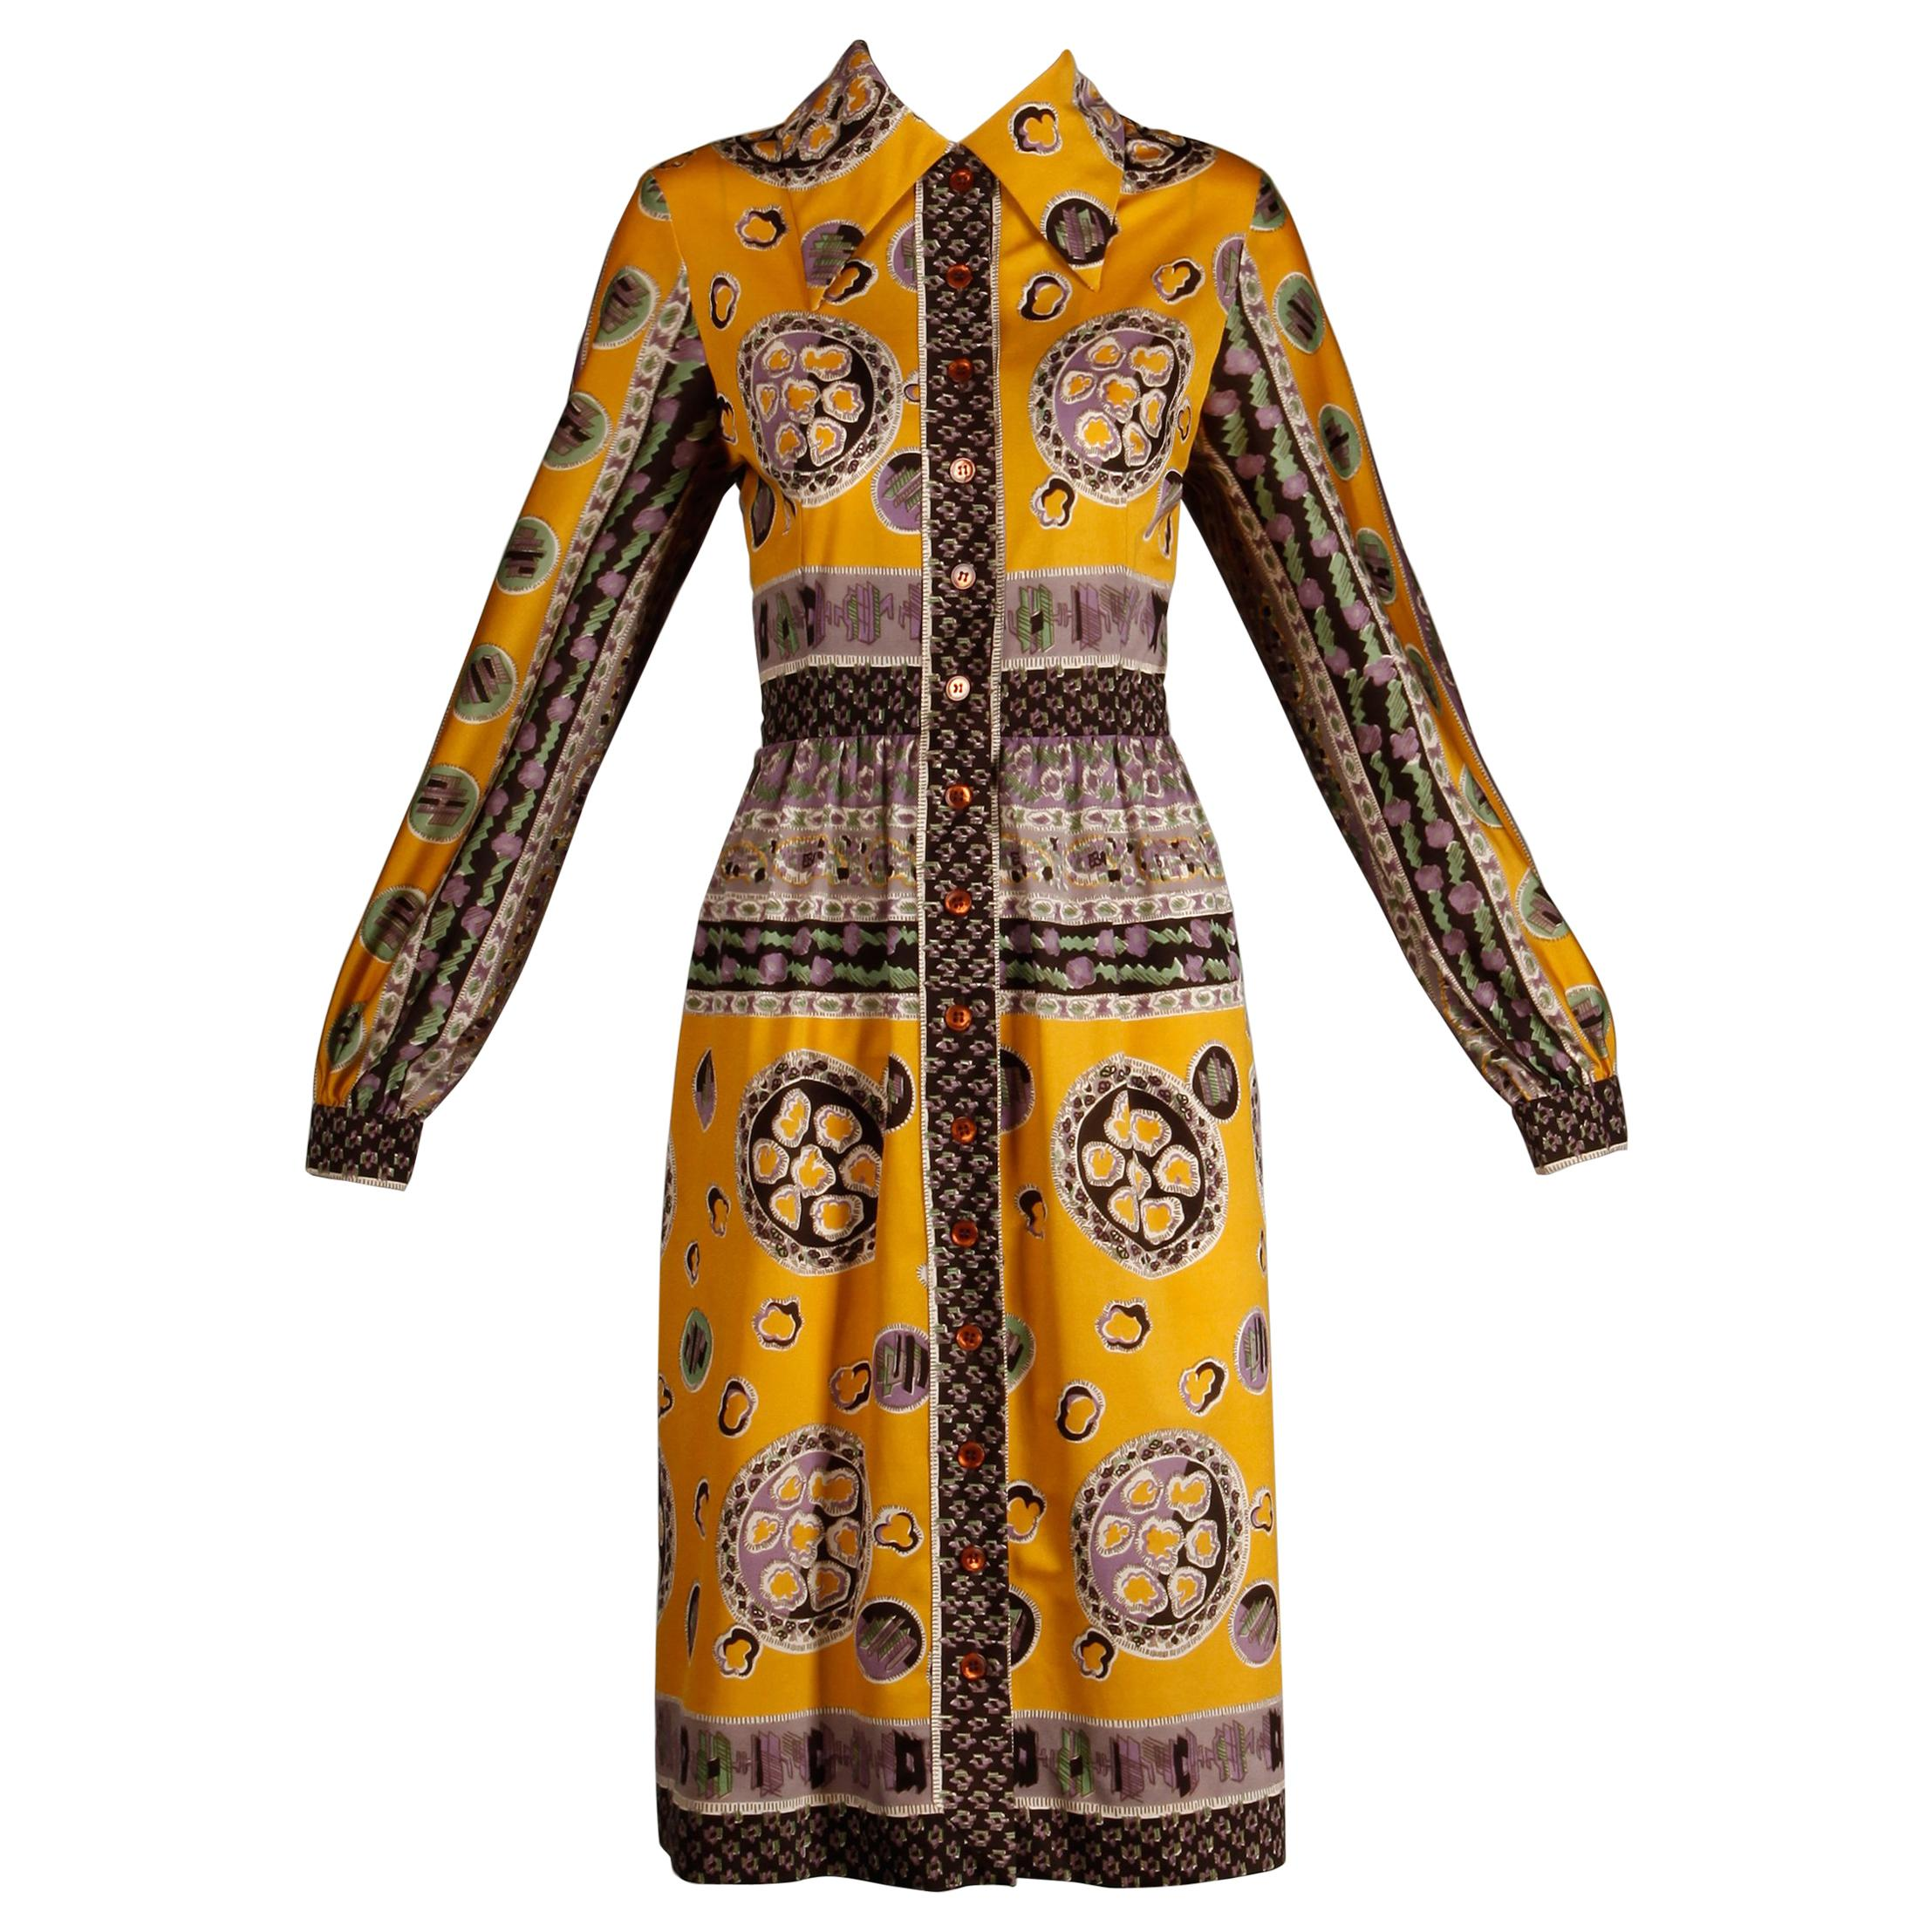 Oscar de la Renta Vintage Silk Jersey Knit Shirt Dress with Scarf Print, 1960s